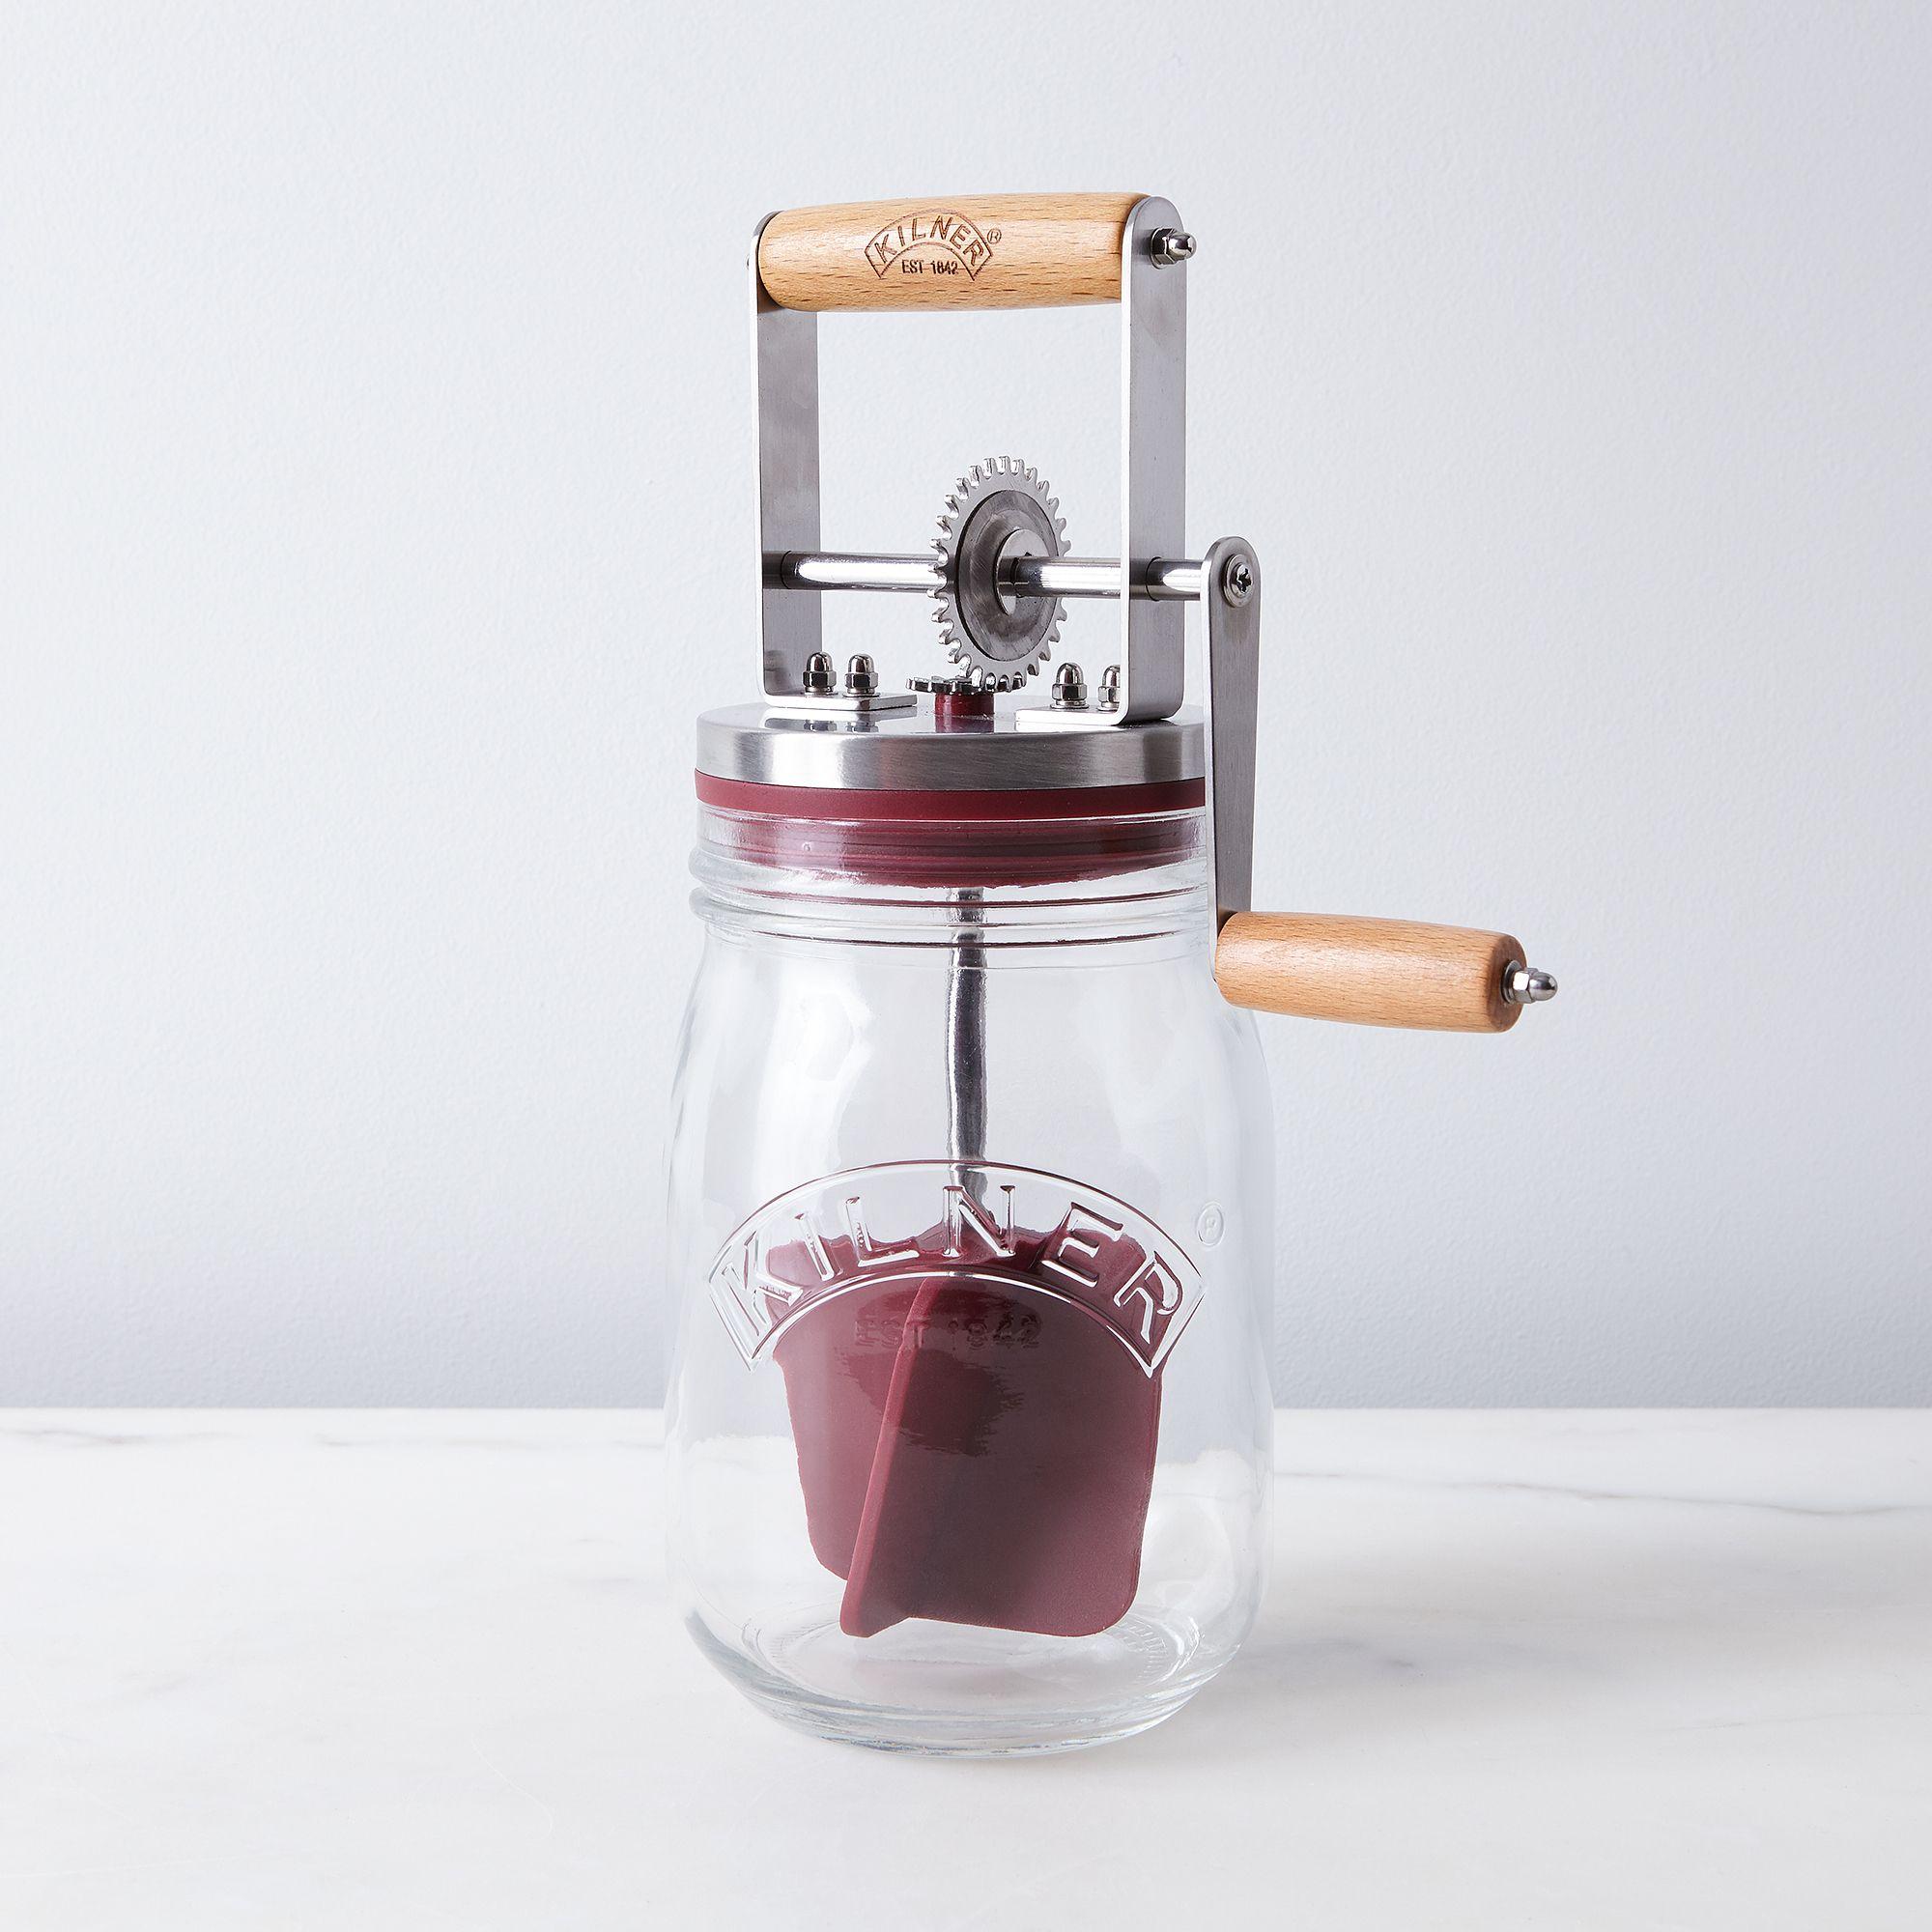 Kitchen Items by Julie